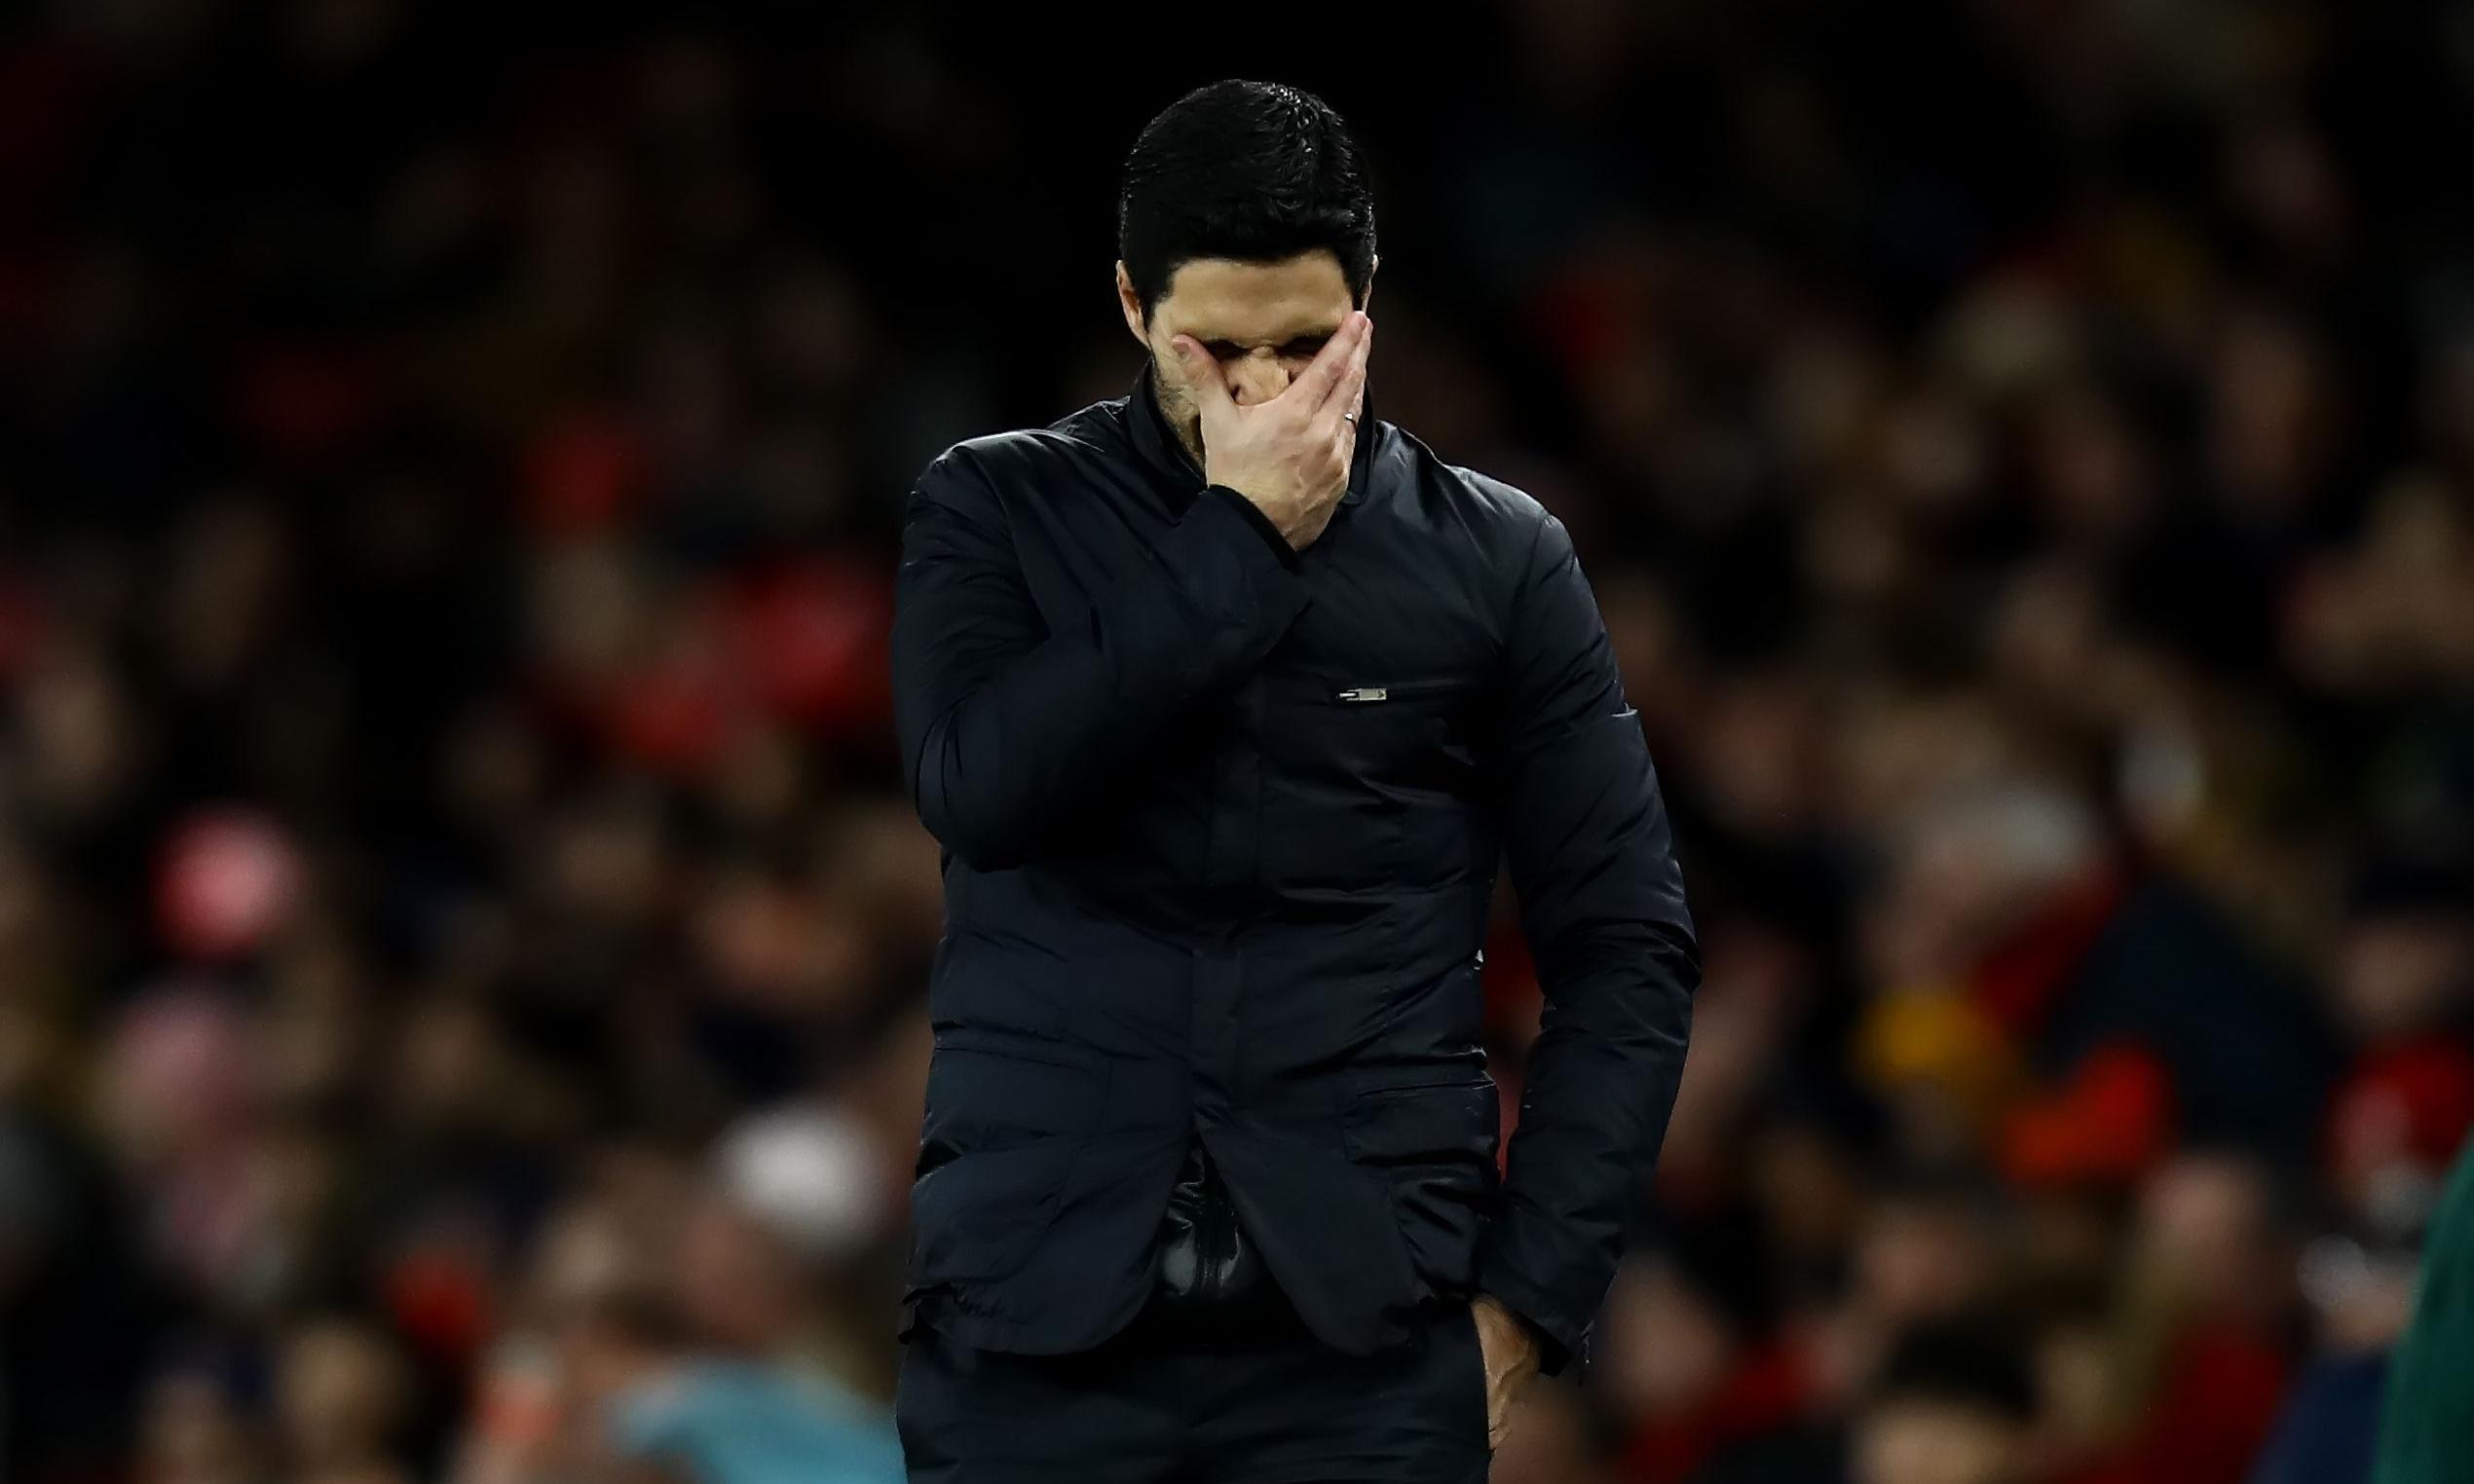 'It hurts': Arteta admits pain of Arsenal's Europa League exit against Olympiakos